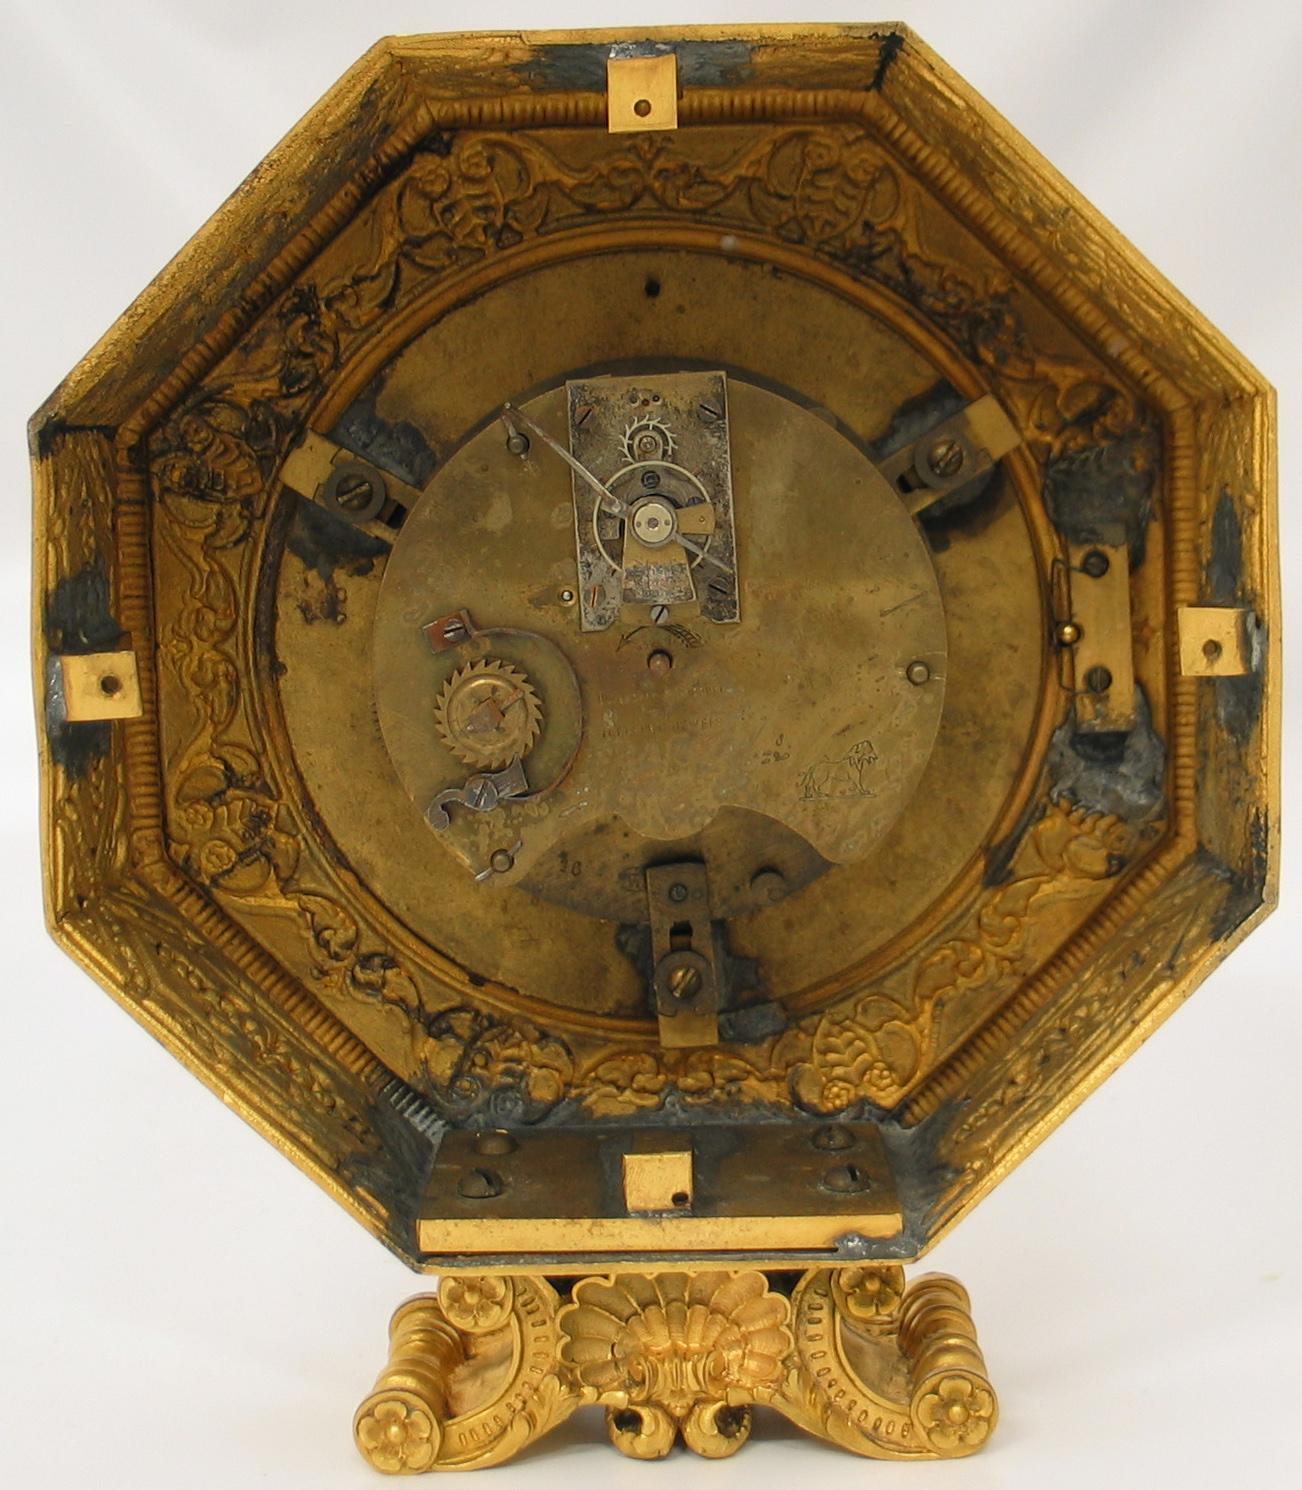 E.F. Caldwell Clock